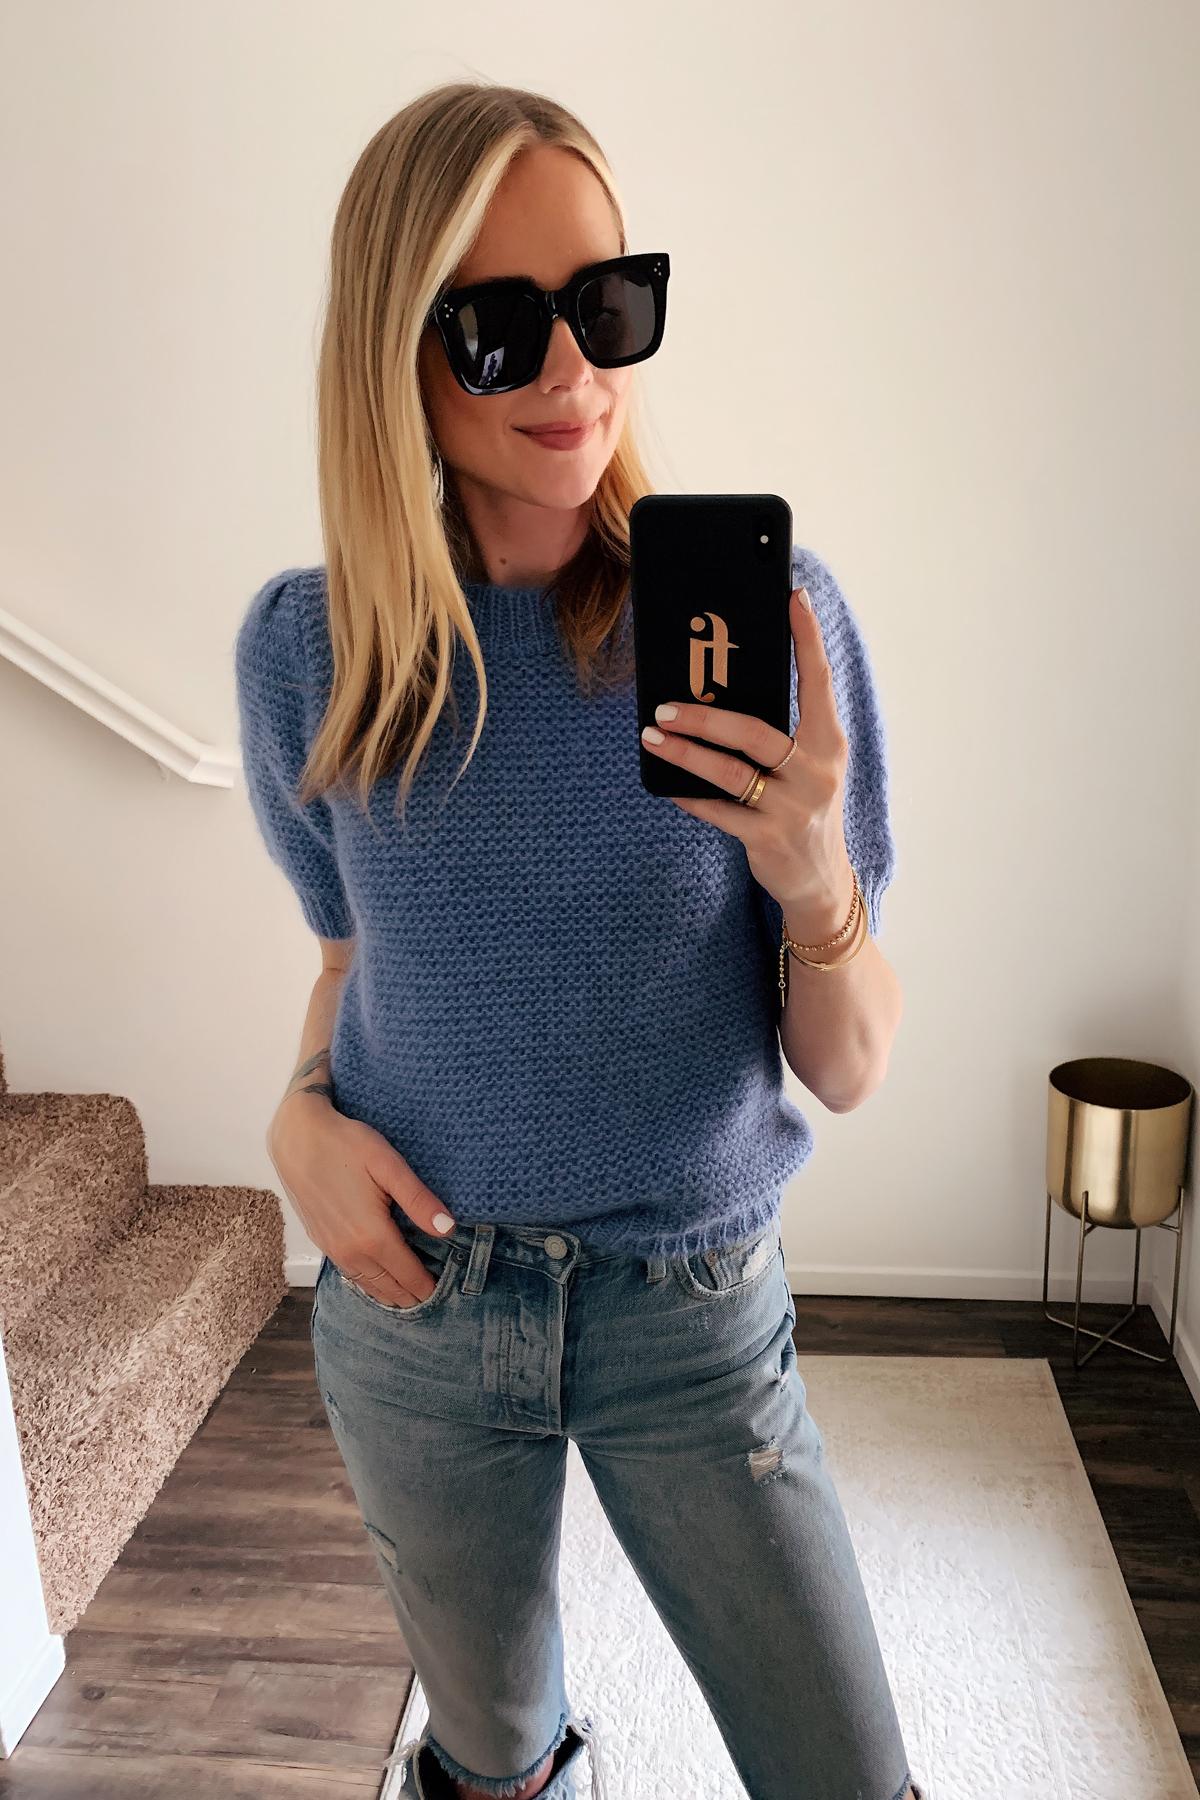 Fashion Jackson Wearing Celine Tilda Black Sunglasses Anine Bing Blue Sweater Ripped Jeans